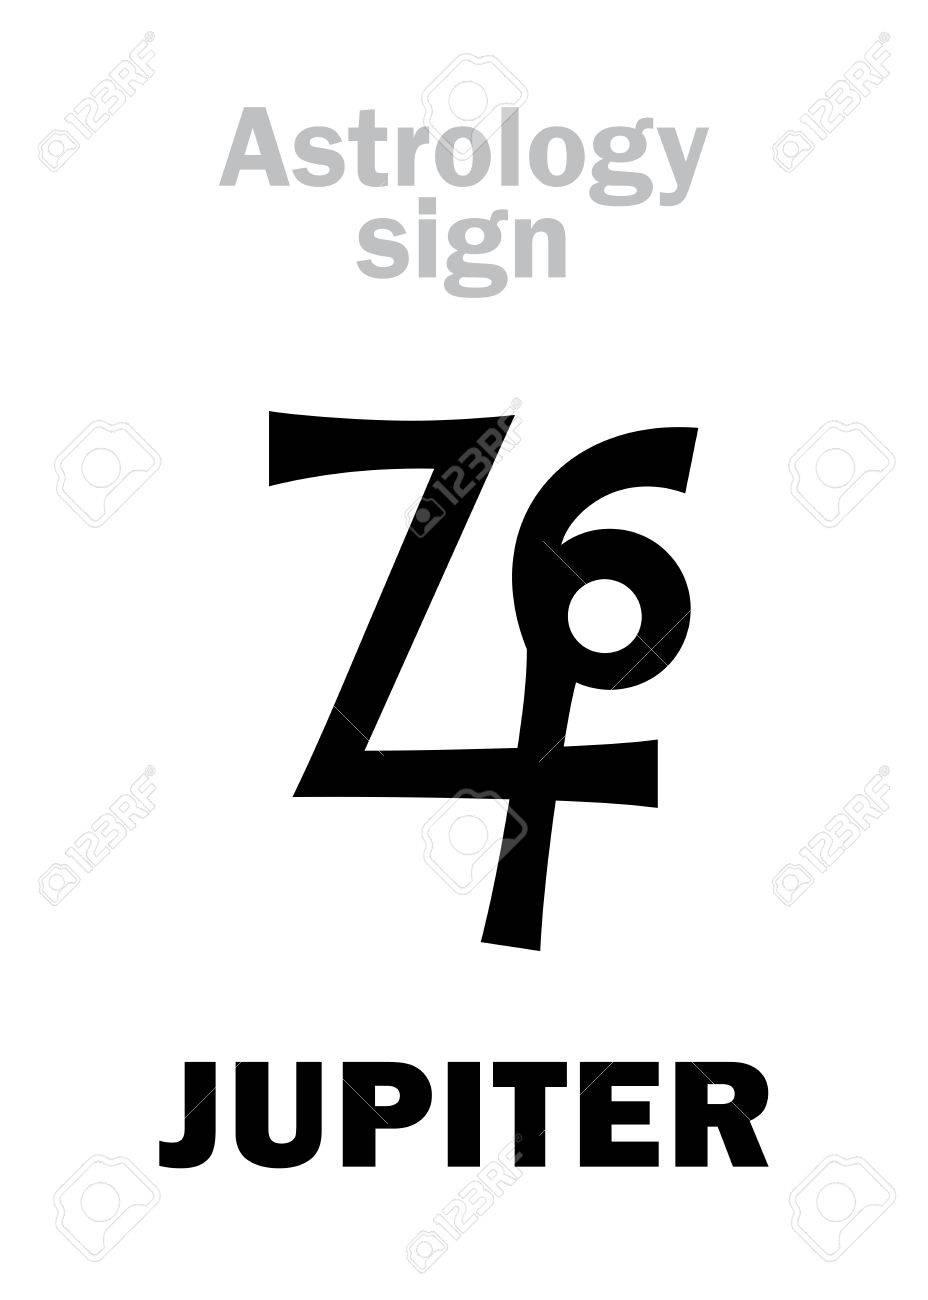 Astrology alphabet jupiter zeus classic major social planet astrology alphabet jupiter zeus classic major social planet hieroglyphics character sign biocorpaavc Images